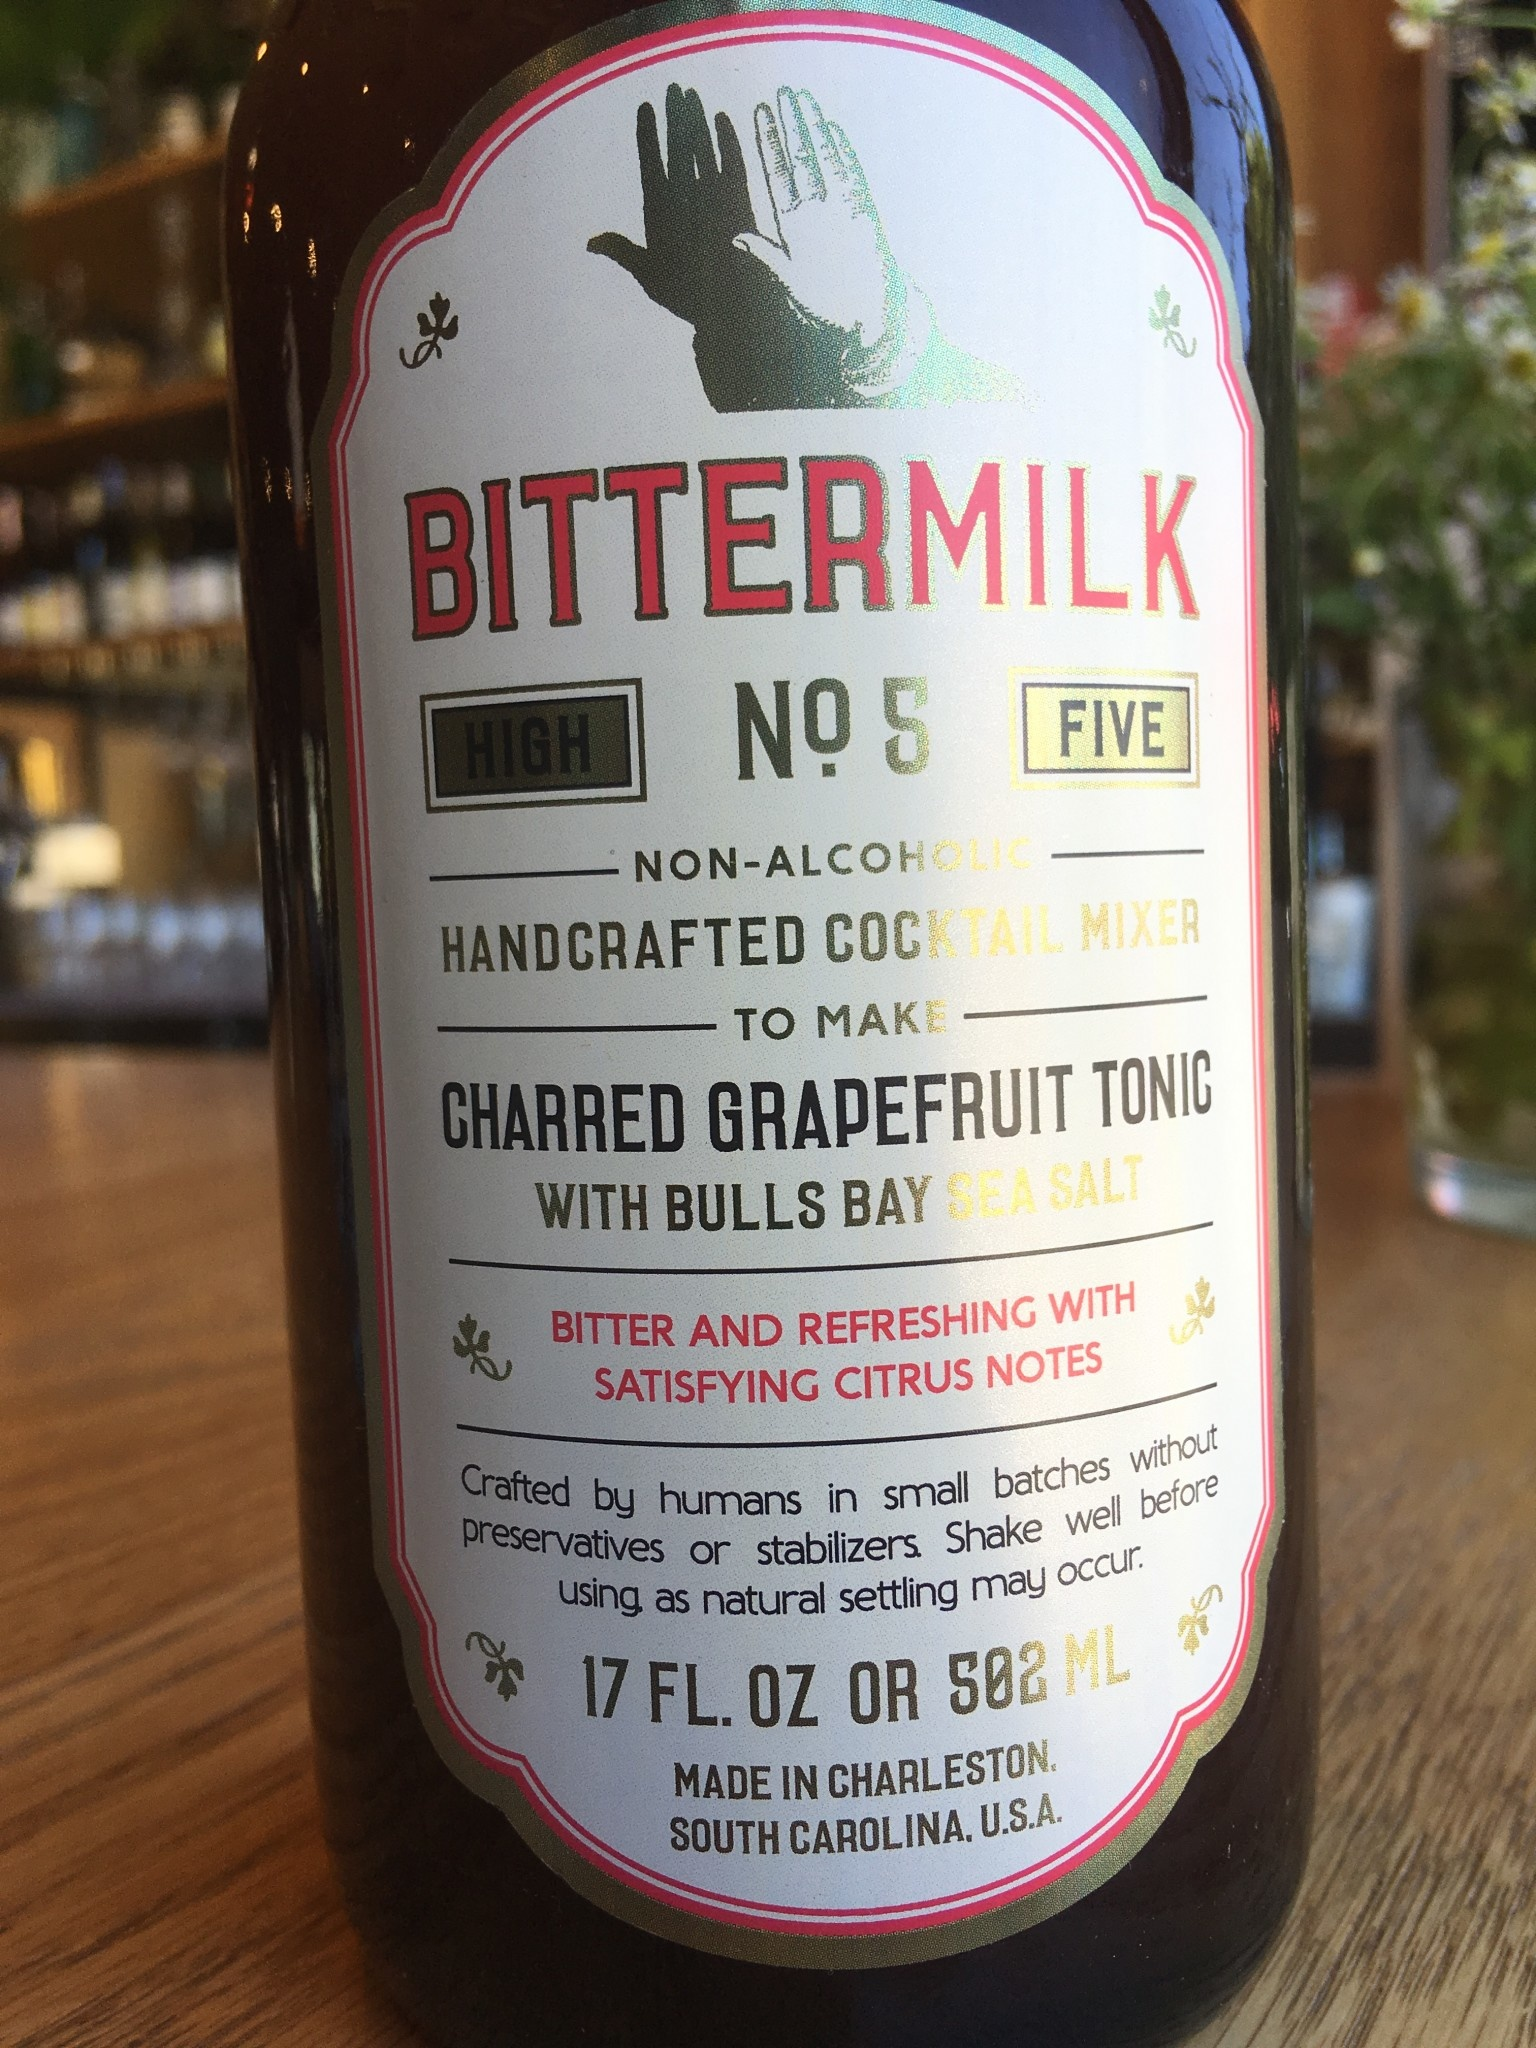 Bittermilk Bittermilk Cocktail Mixers No. 5 Charred Grapefruit Tonic